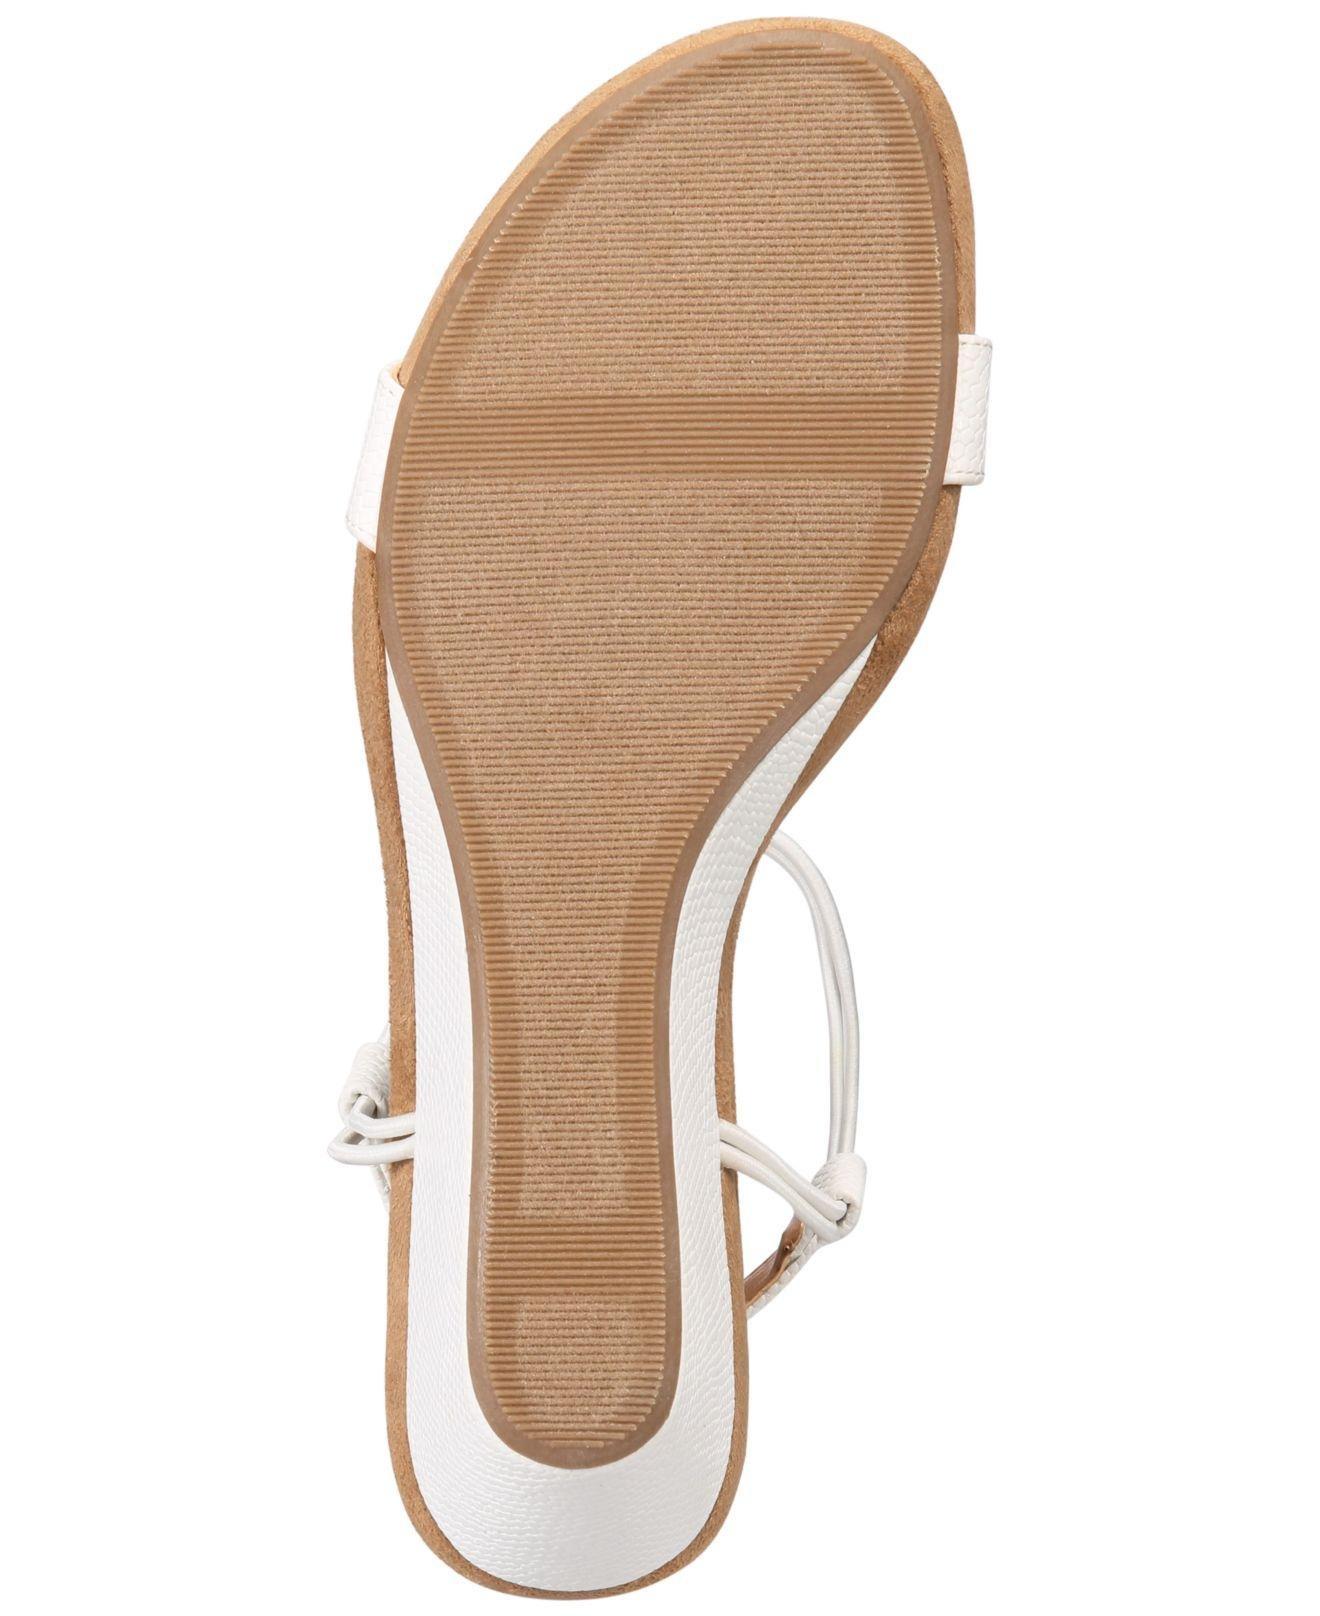 Style & Co. Womens Mulan Open Toe Casual Platform, White Snake, Size 10.0